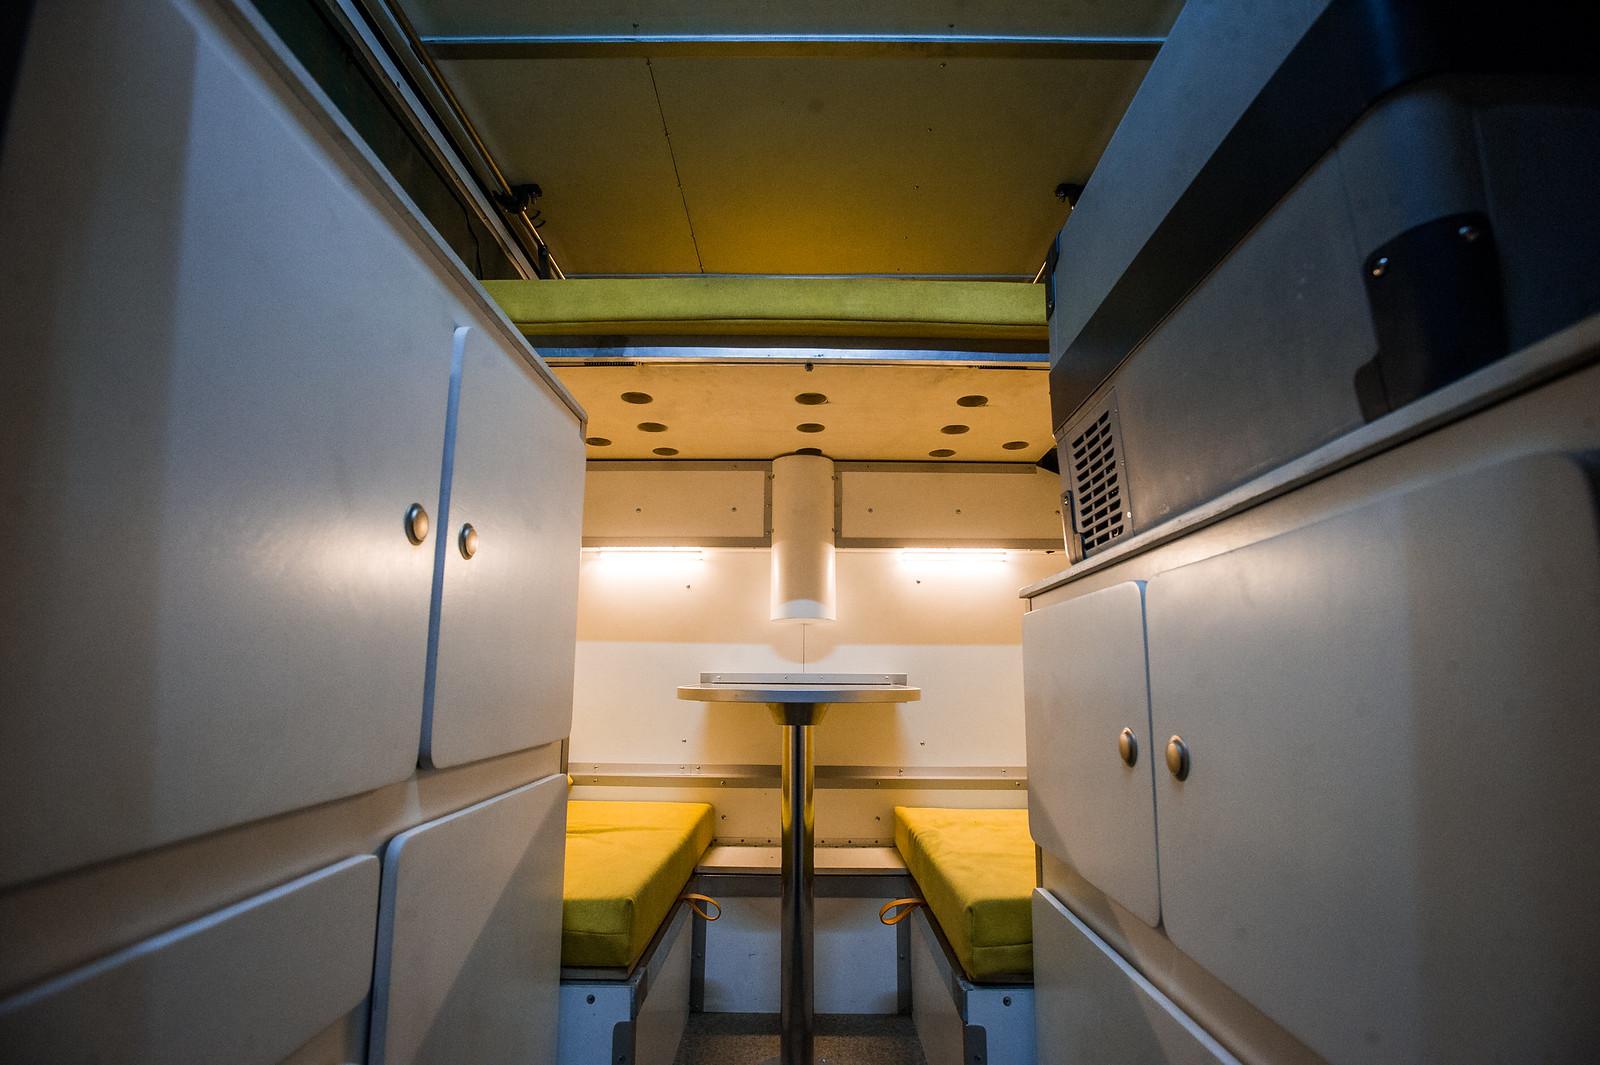 Продам Toyota Hilux Off-Road Camper 37859593295_0260742250_h